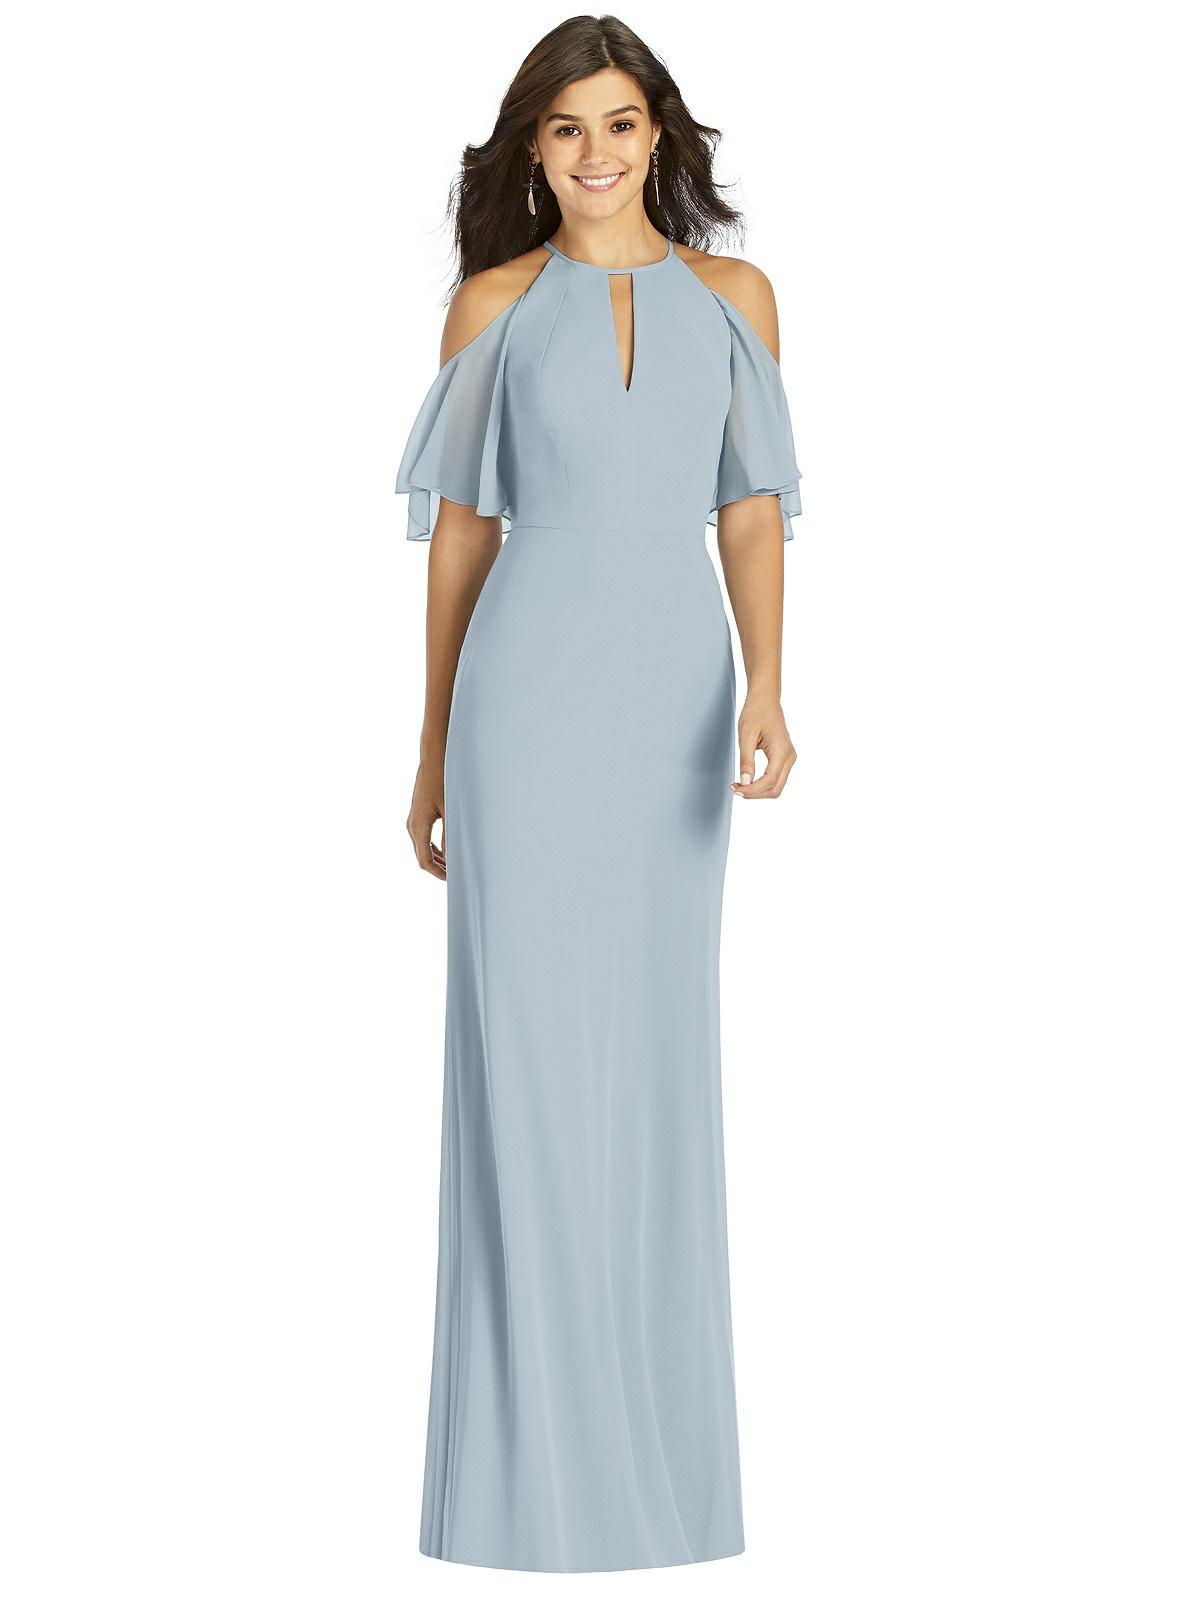 70s Sequin Dresses, Disco Dresses Special Order Ruffle Cold-Shoulder Mermaid Maxi Dress $99.00 AT vintagedancer.com